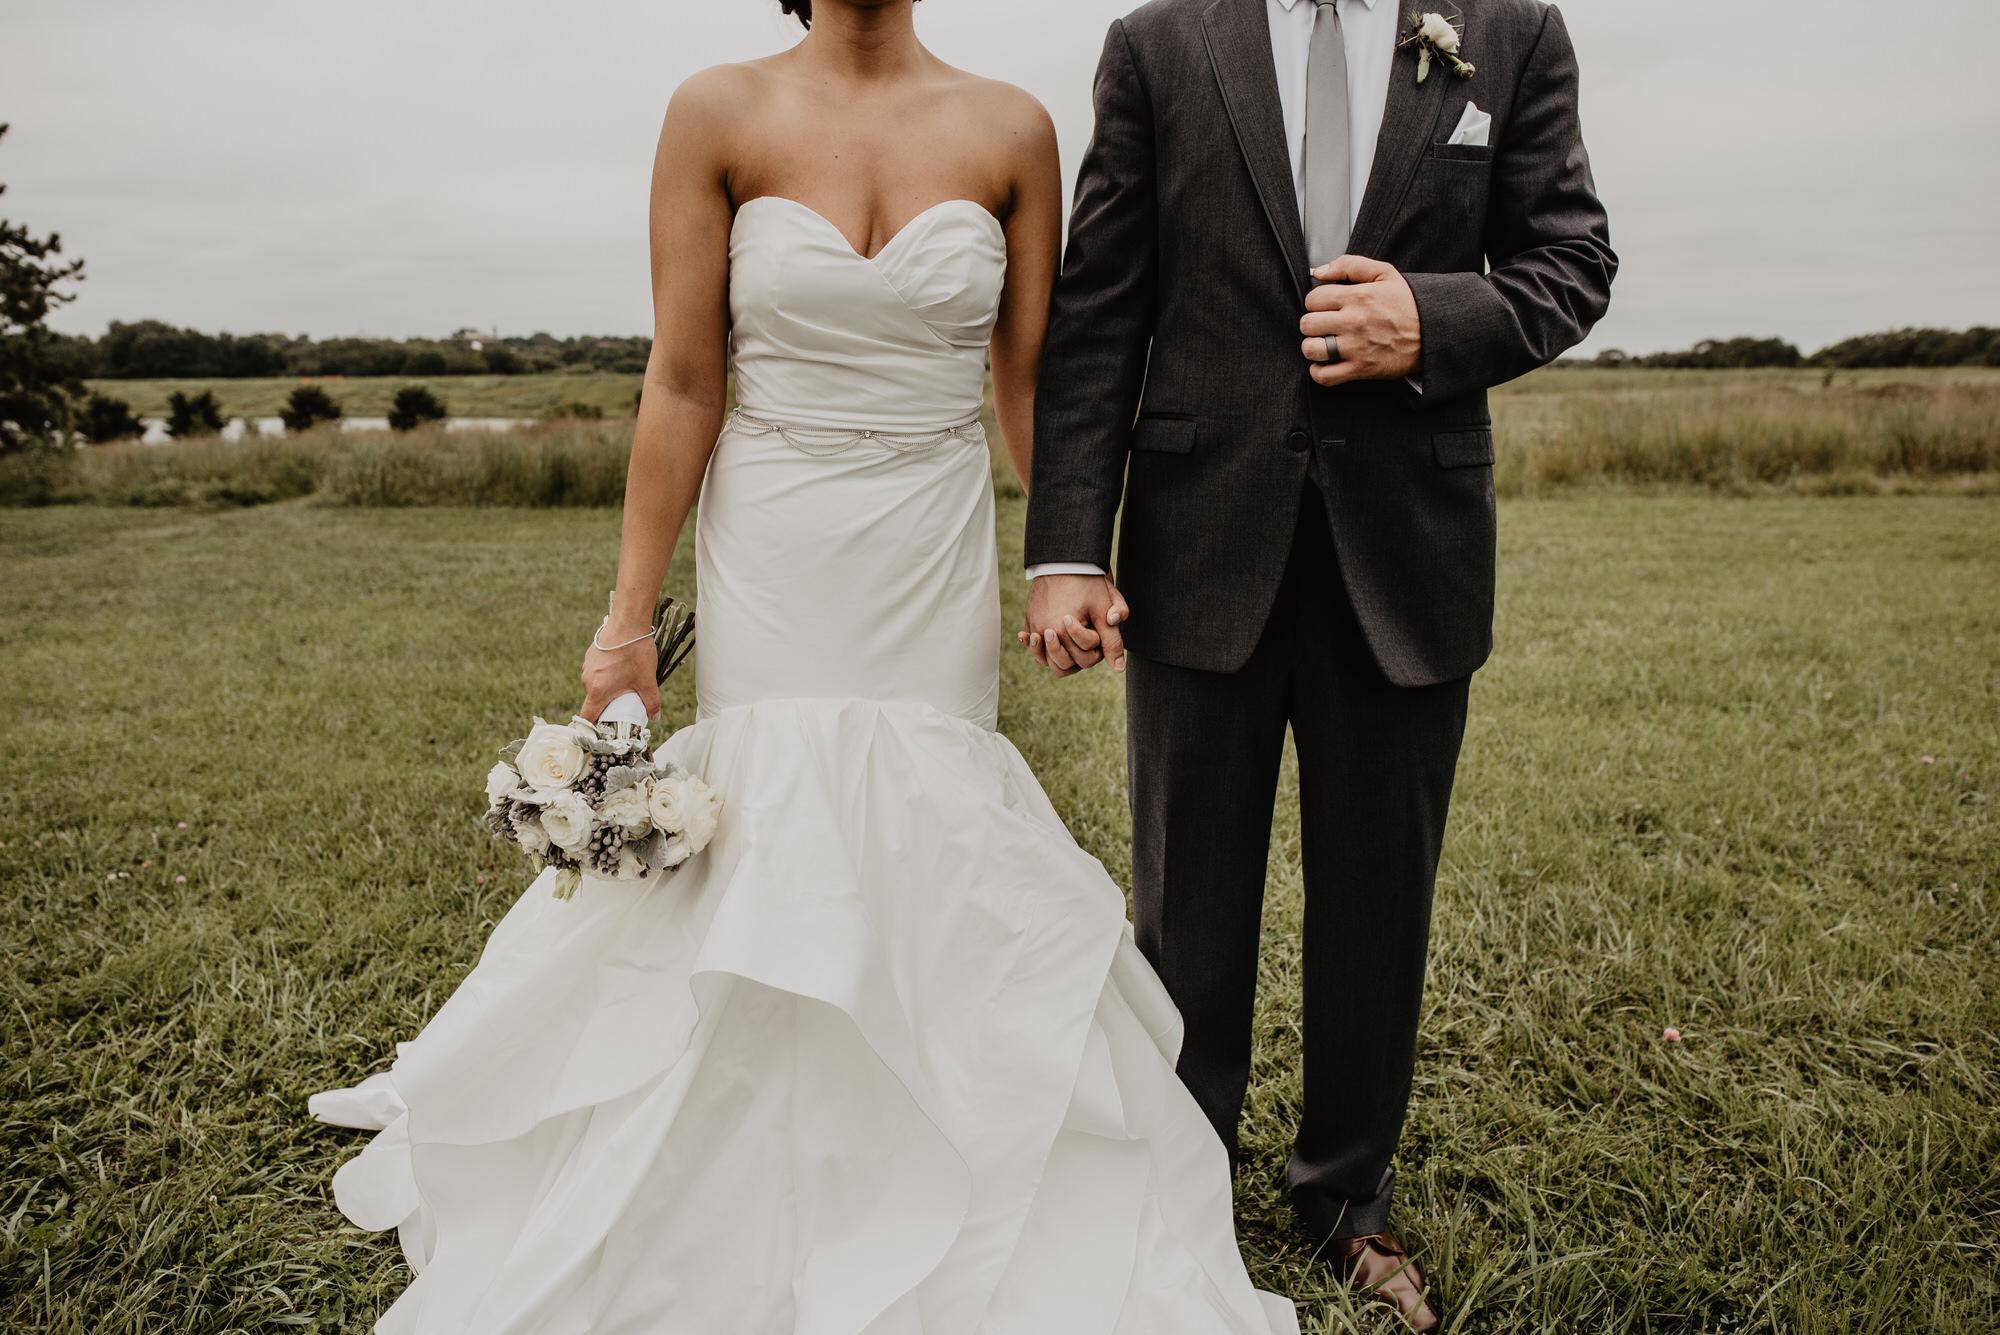 Kaylie_Sirek_Photography_Grand_Island_Kearney_Hastings_Lincoln_Nebraska_Wedding_Engagement_Grandma_Grandparent_Delray_Downtown_DowntownLincoln_LNK_Emotional_Bride_Groom_Photographer_57.jpg